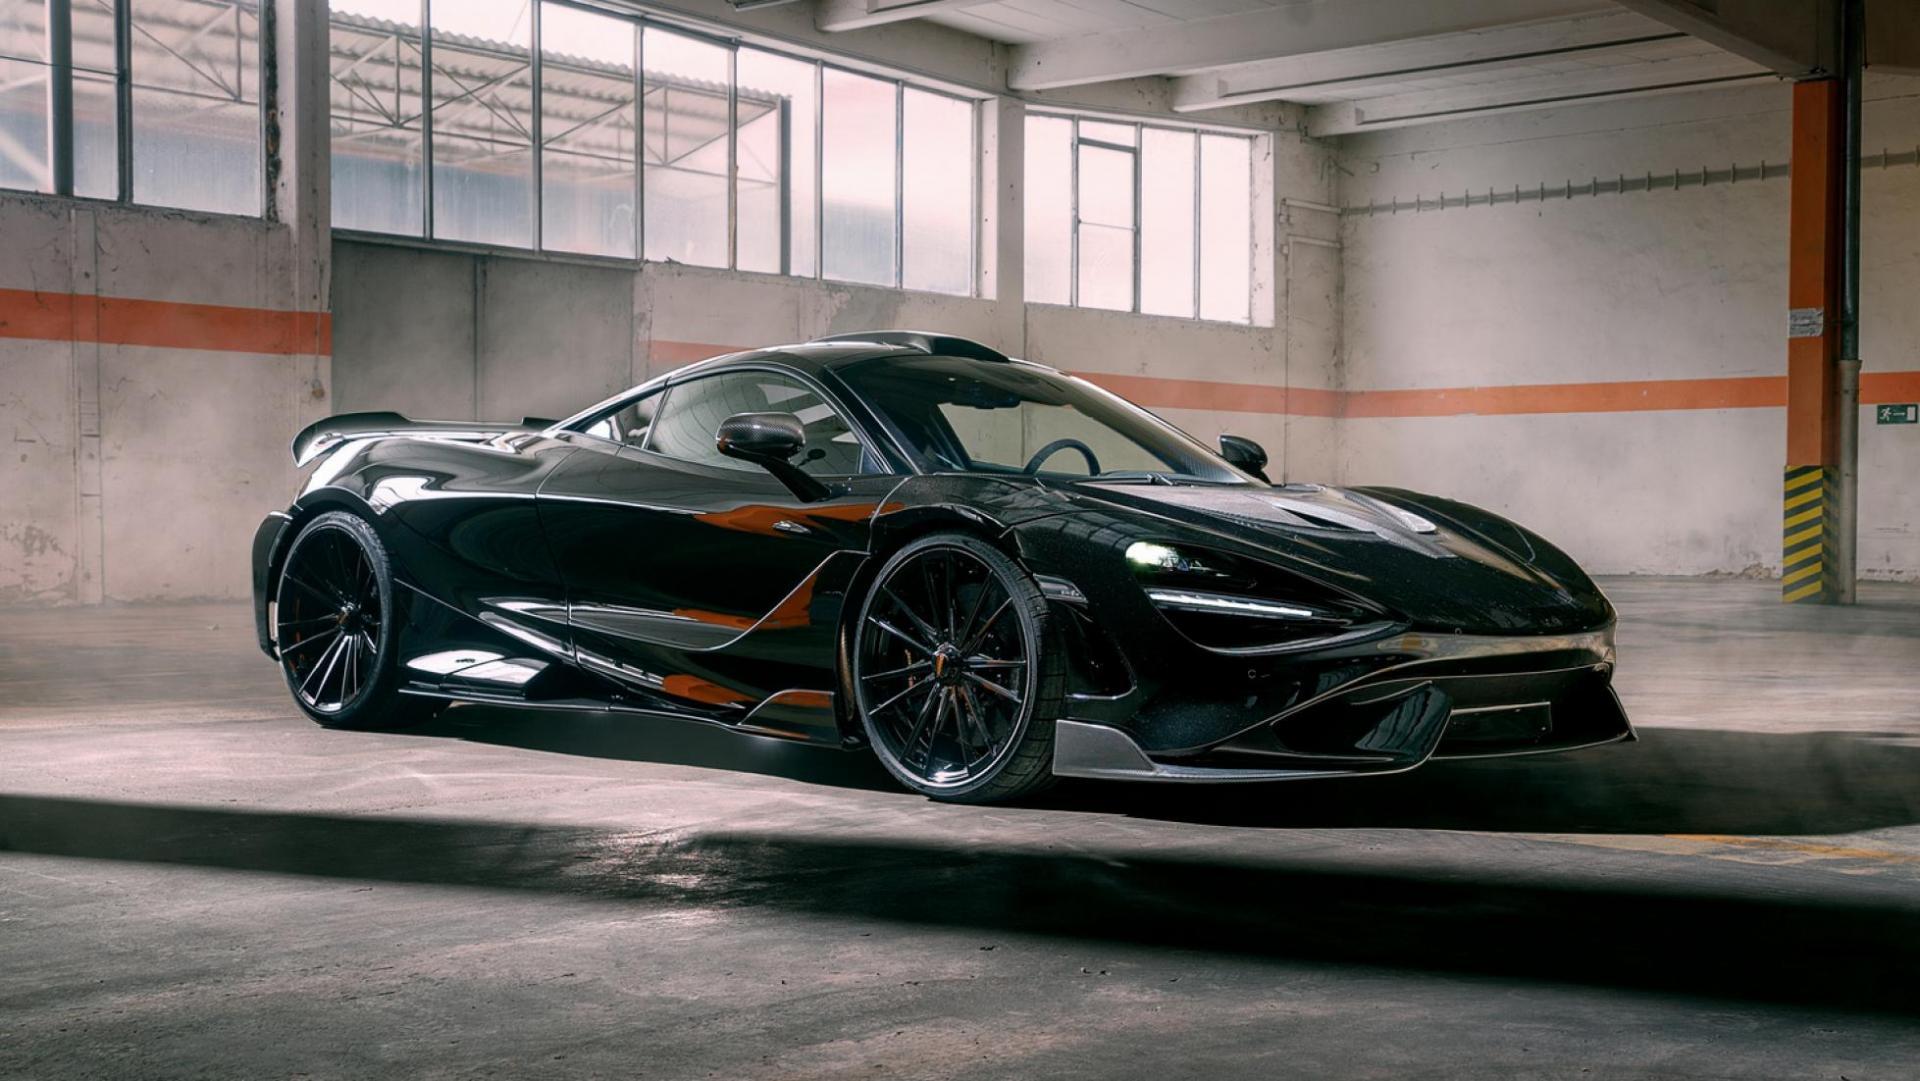 Novitec has given the McLaren 765LT even more power